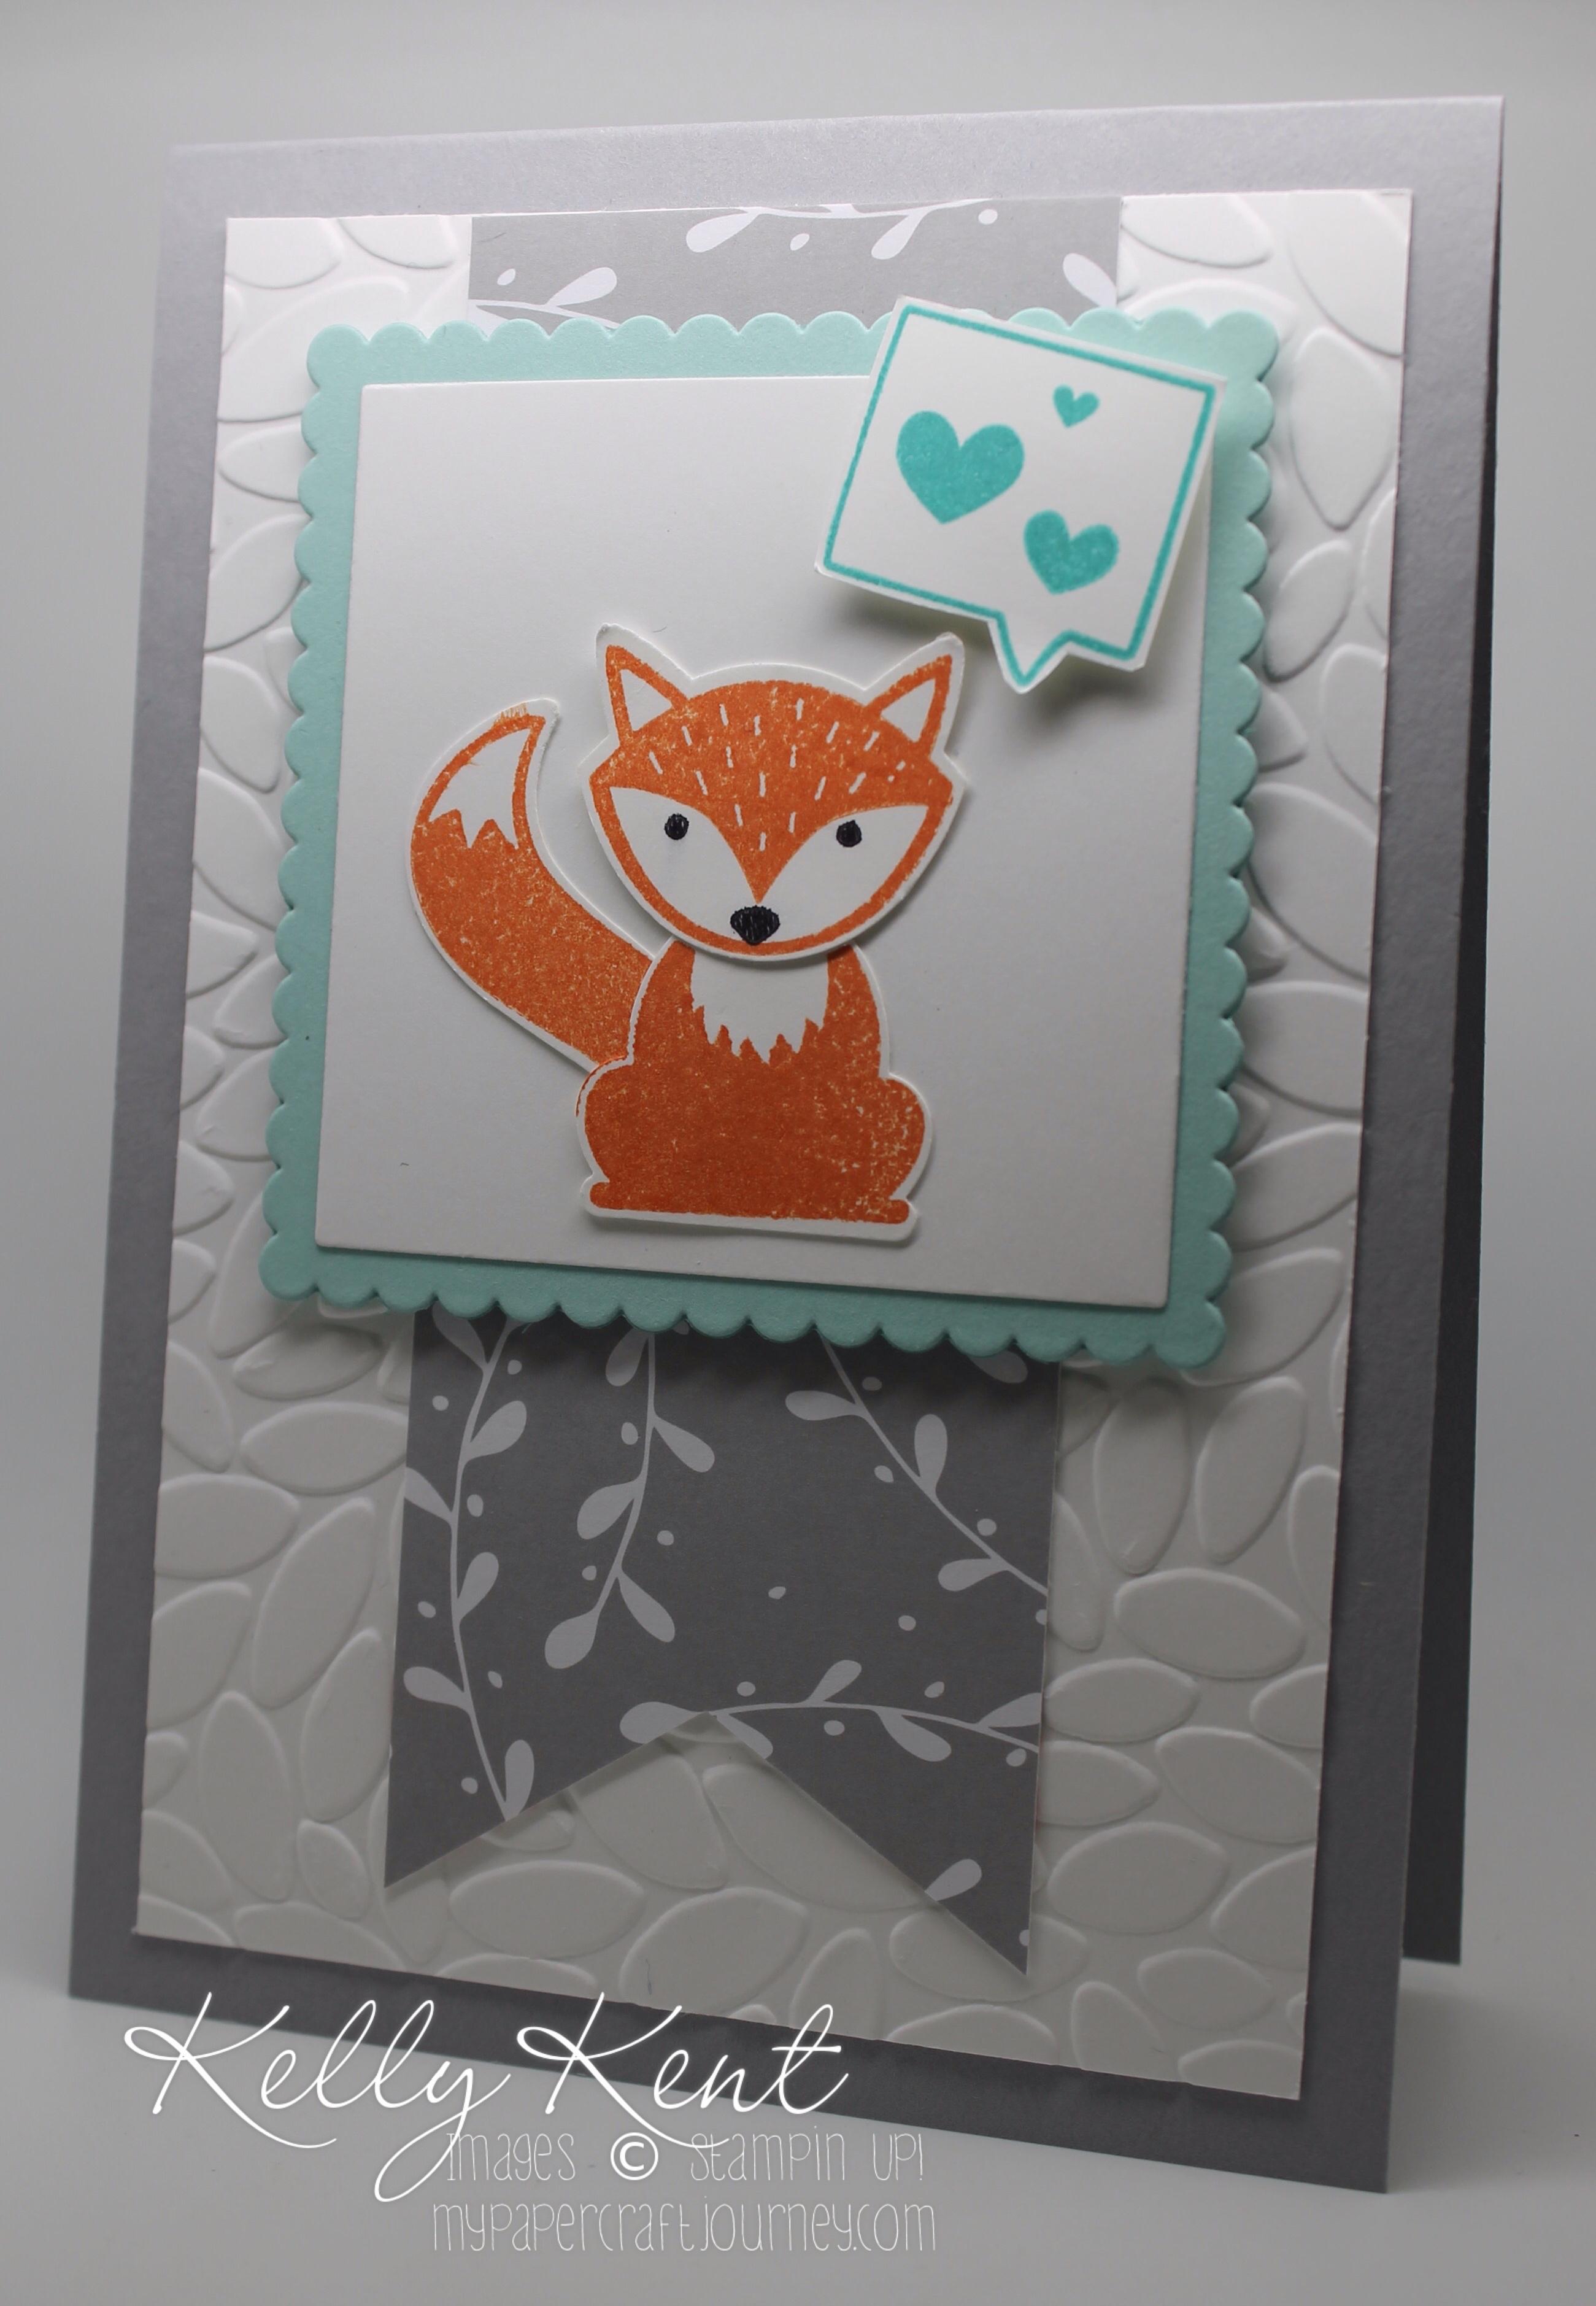 Mr Foxy & His Fabulous Friends - A Little Foxy Suite: Foxy Friends stamp set, Fox Builder punch & A Little Foxy DSP. Fox version. Kelly Kent - mypapercraftjourney.com.